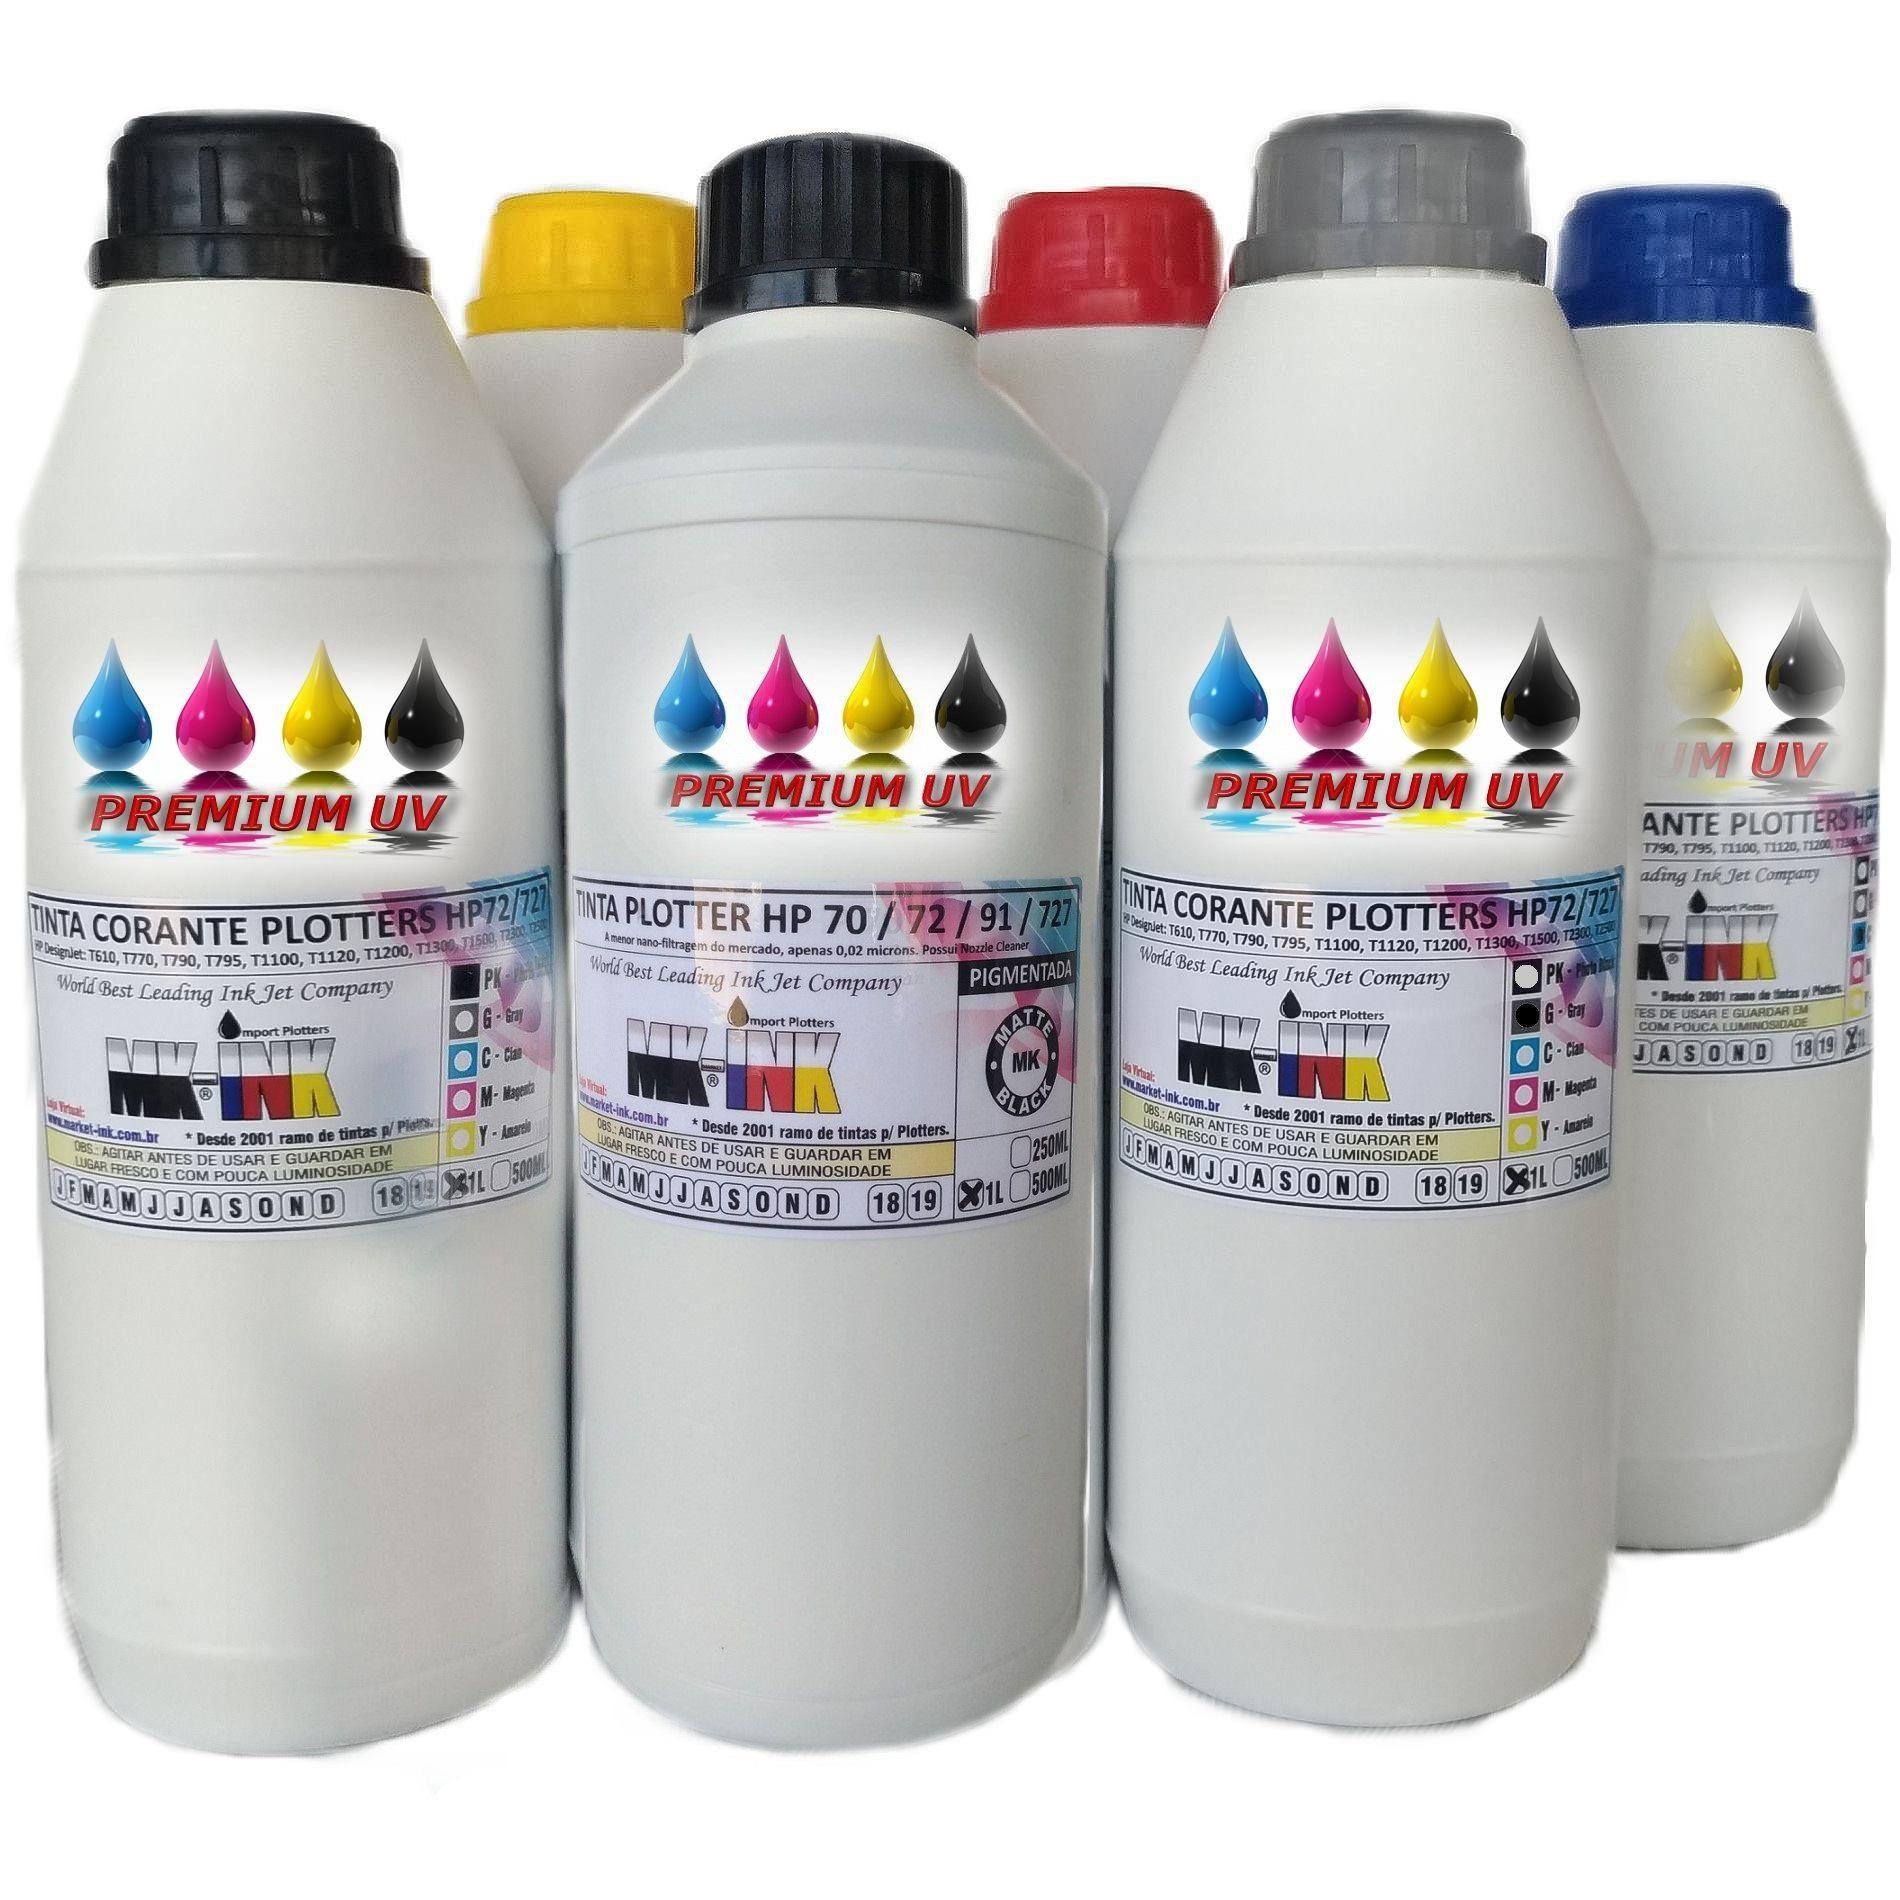 Tinta litro Premium UV litro Plotter dos cartuchos HP72, HP727 modelos Plotter HP: T610, T770, T790, T795,T920, T1100, T1120, T1200, T1300, T1500, T2300, T2500